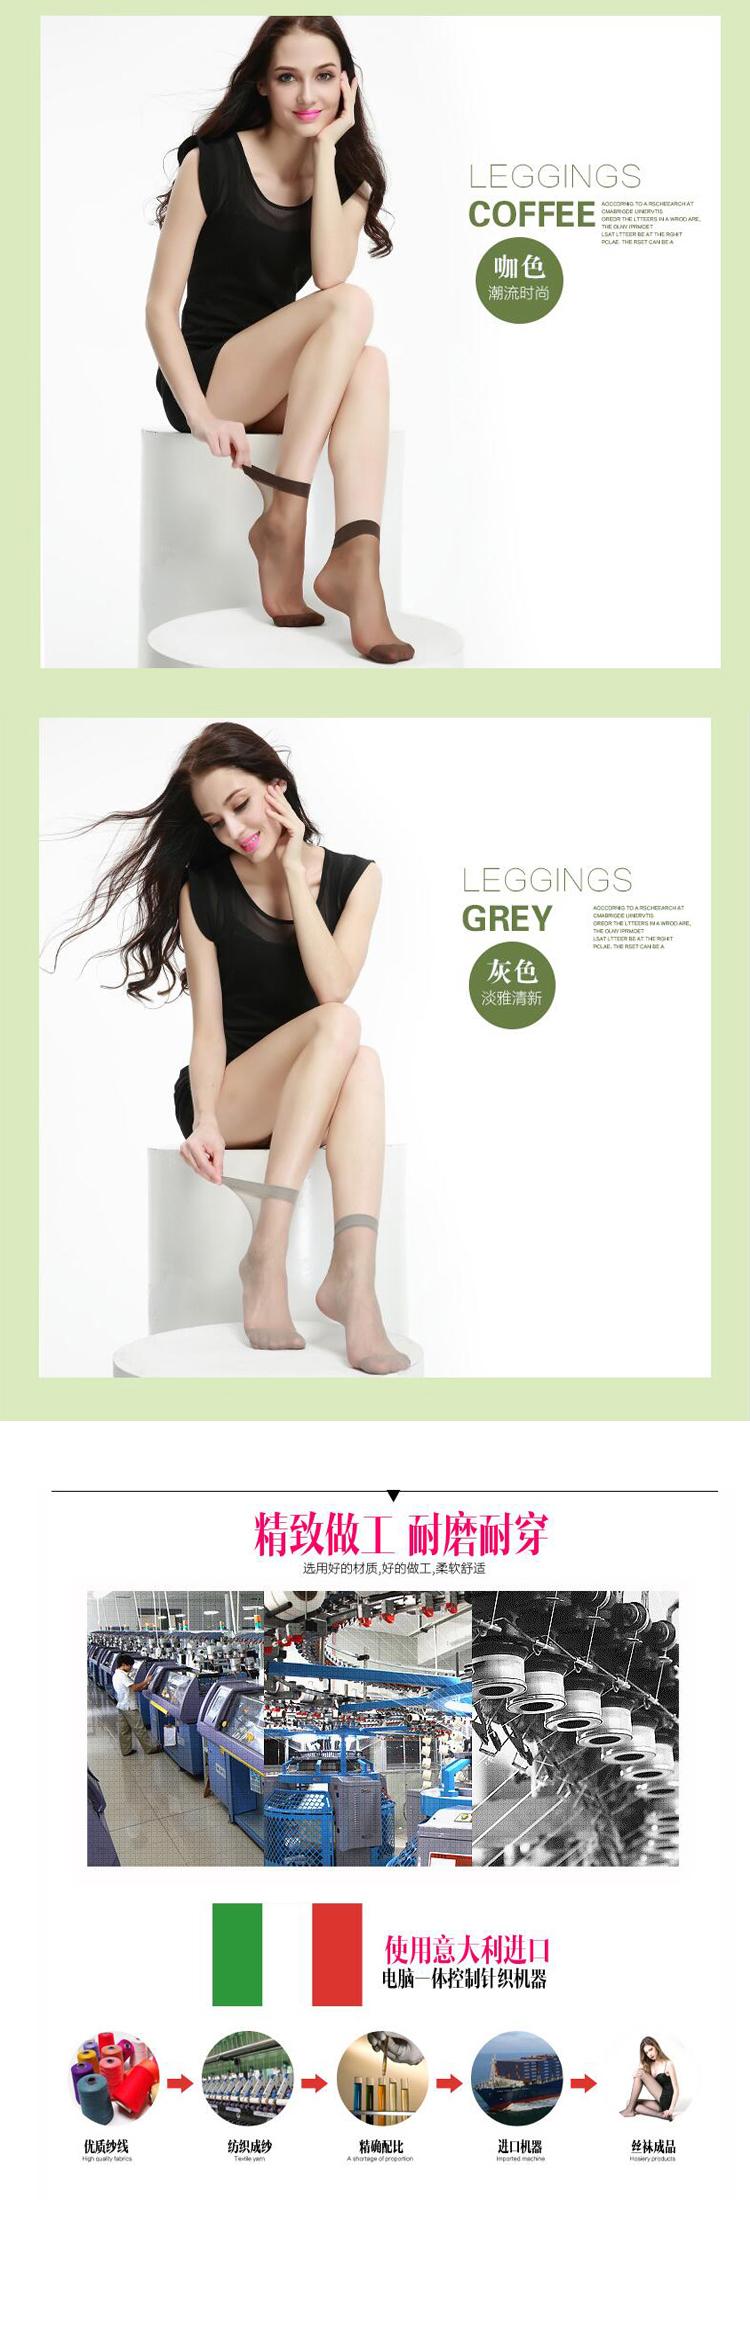 Z216浪莎5双装包芯丝短丝袜女防勾丝女士夏季薄款丝袜子女超薄肉色丝袜短袜新品